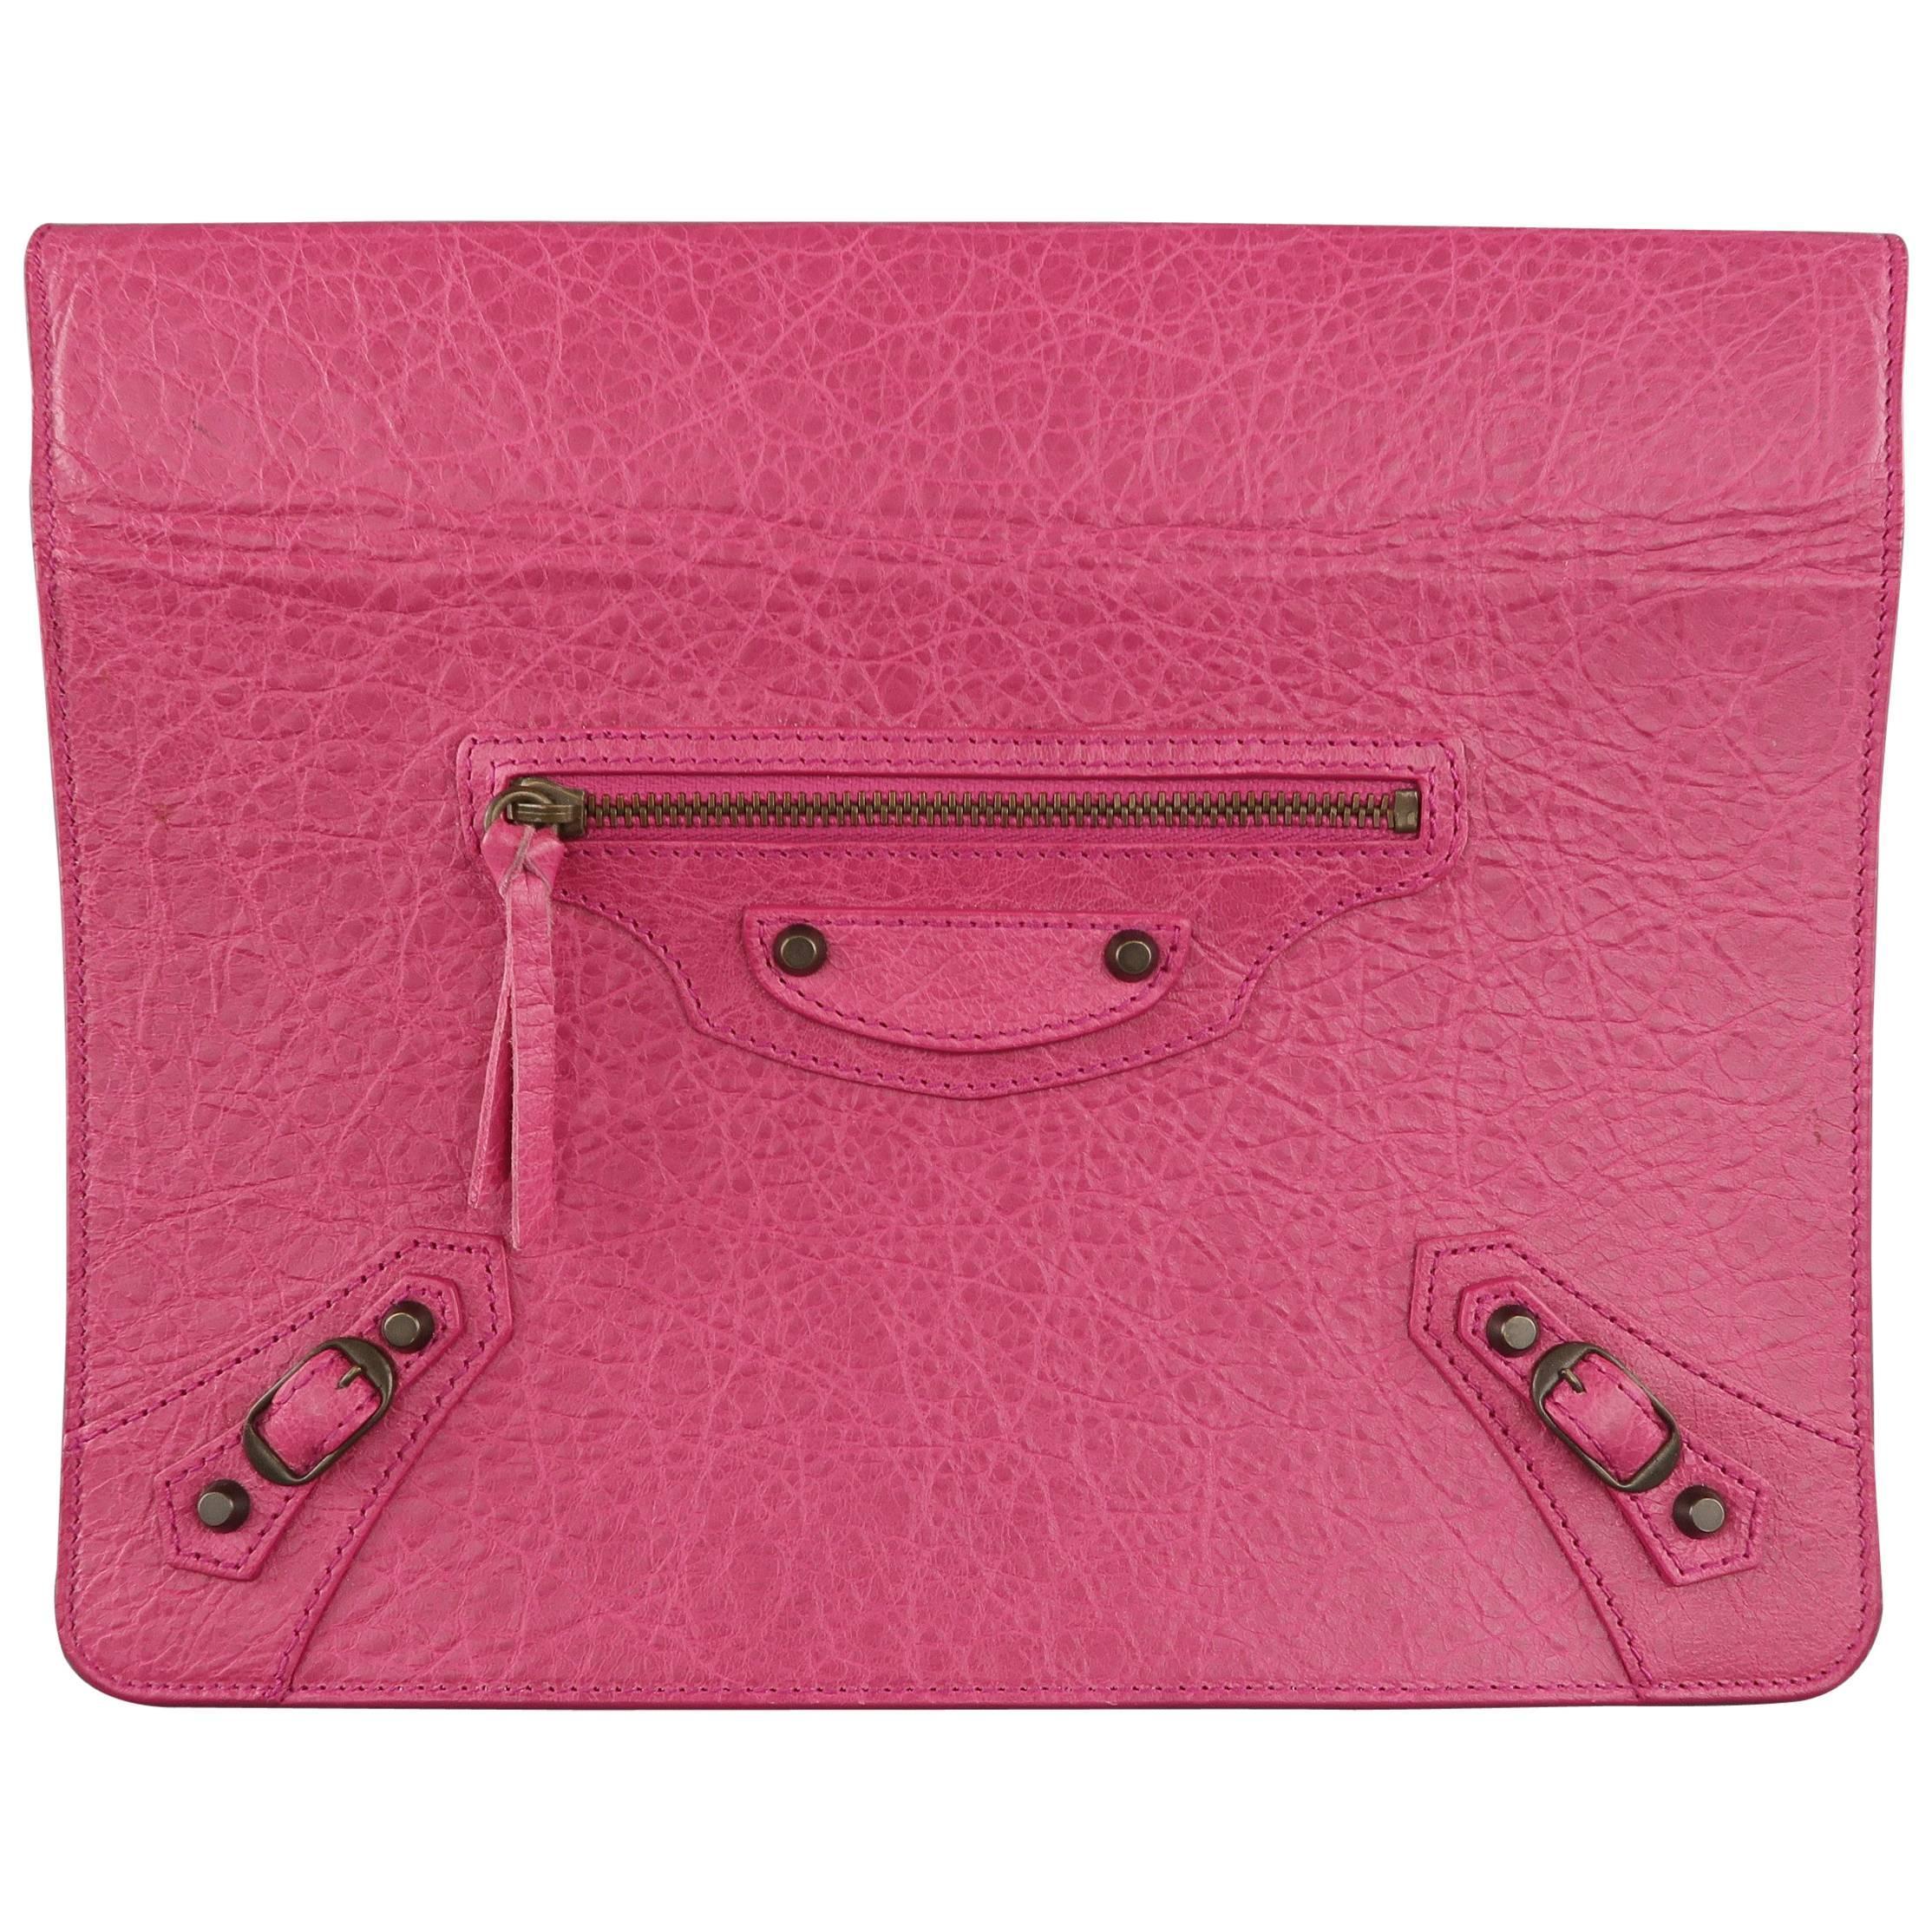 2 Leather Ipad Case Venta Dark Stand Moto Fuchsia En Pink Textured Balenciaga q4Zw0fp6